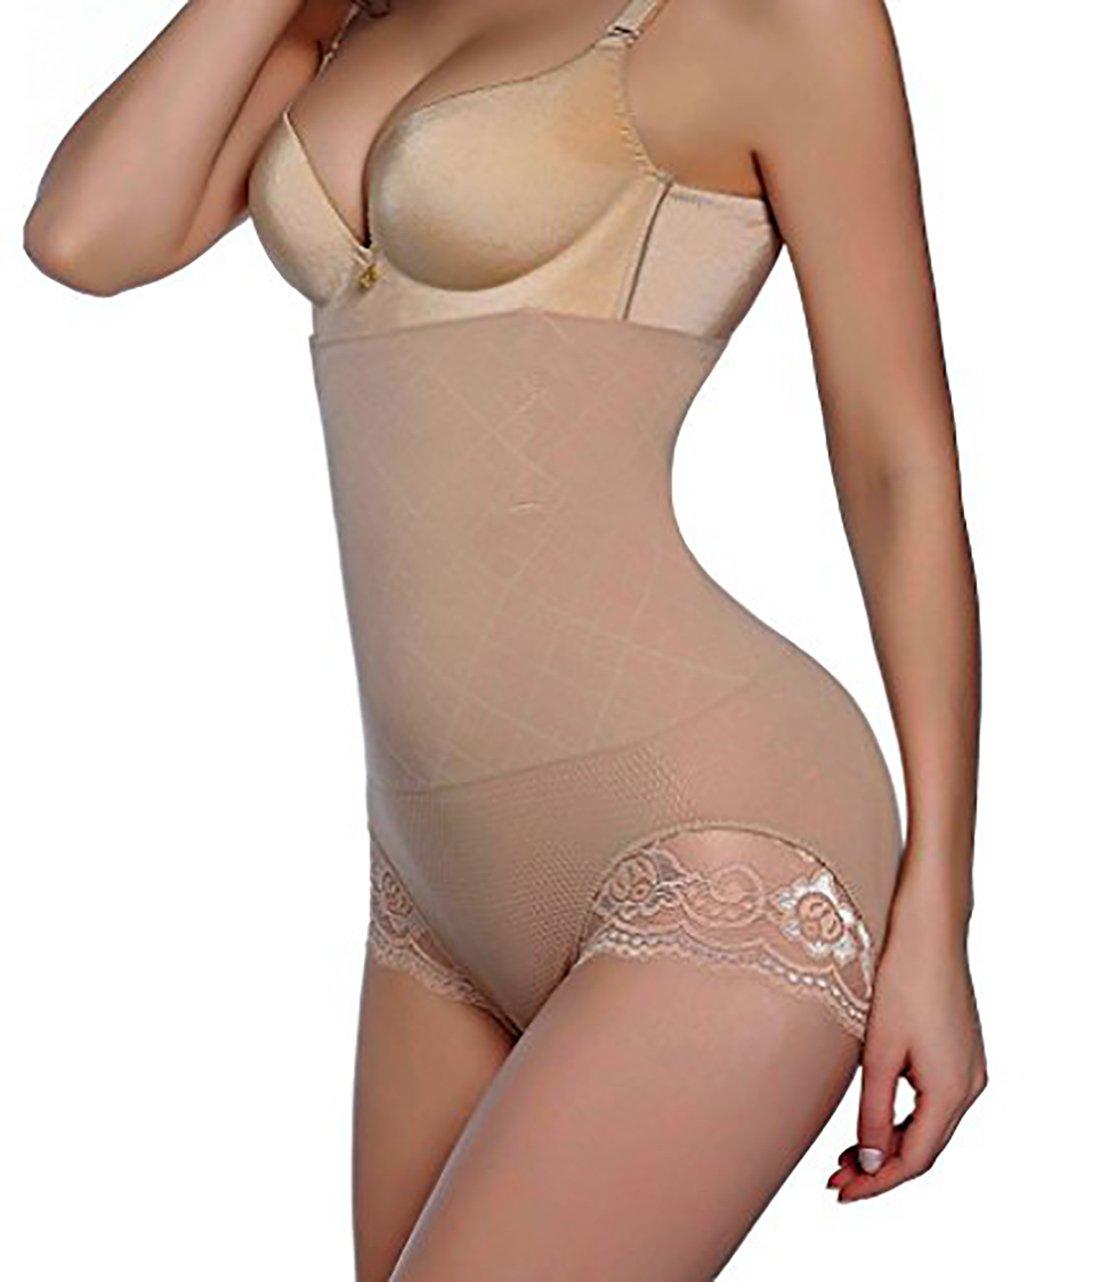 GAODI Women Body Shaper Butt Lifter Hi-Waist Panty Seamless Waist Trainer Tummy Control Shapewear (M/L, Beige)